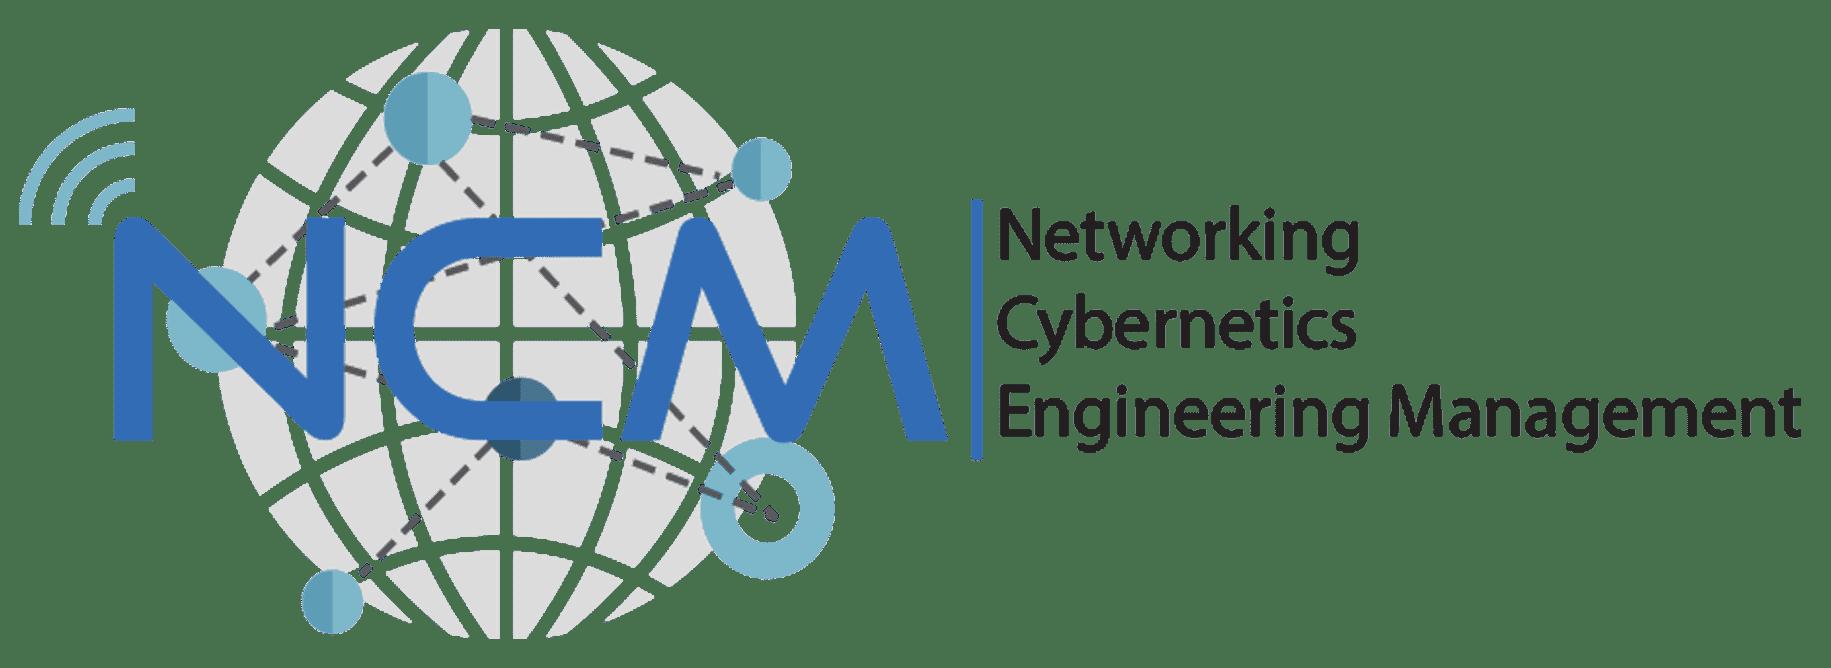 KK Networking, Cybernetics, and Engineering Management